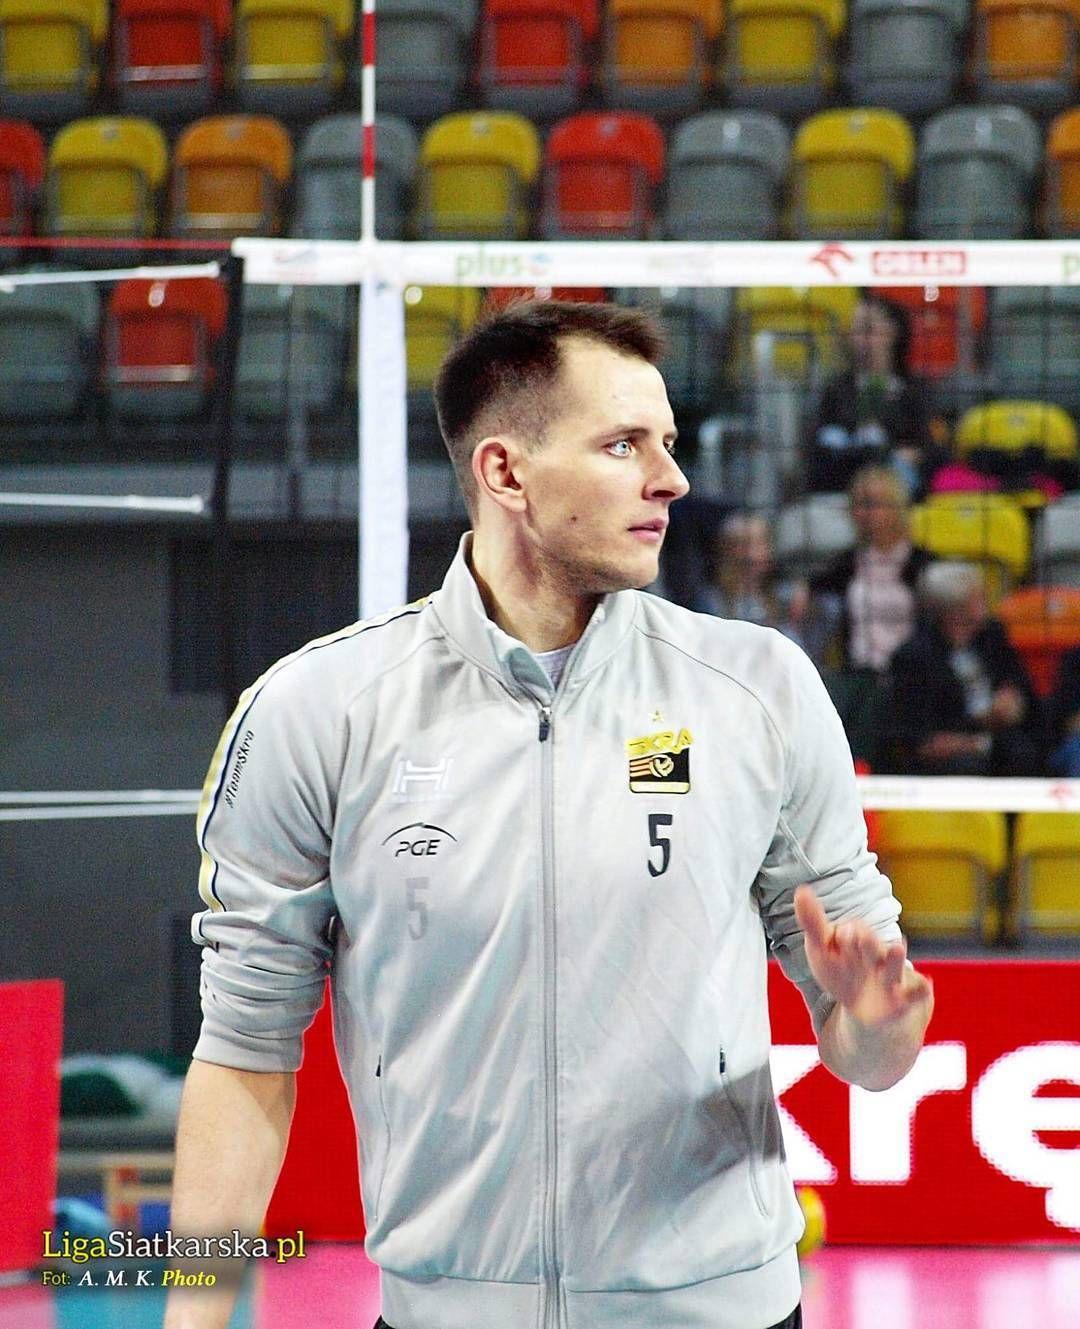 Bartosz kurek & anna grejman made their social media debut as a couple but that didn't turn out well. Polubienia: 129, komentarze: 1 - Ligasiatkarska.pl ...